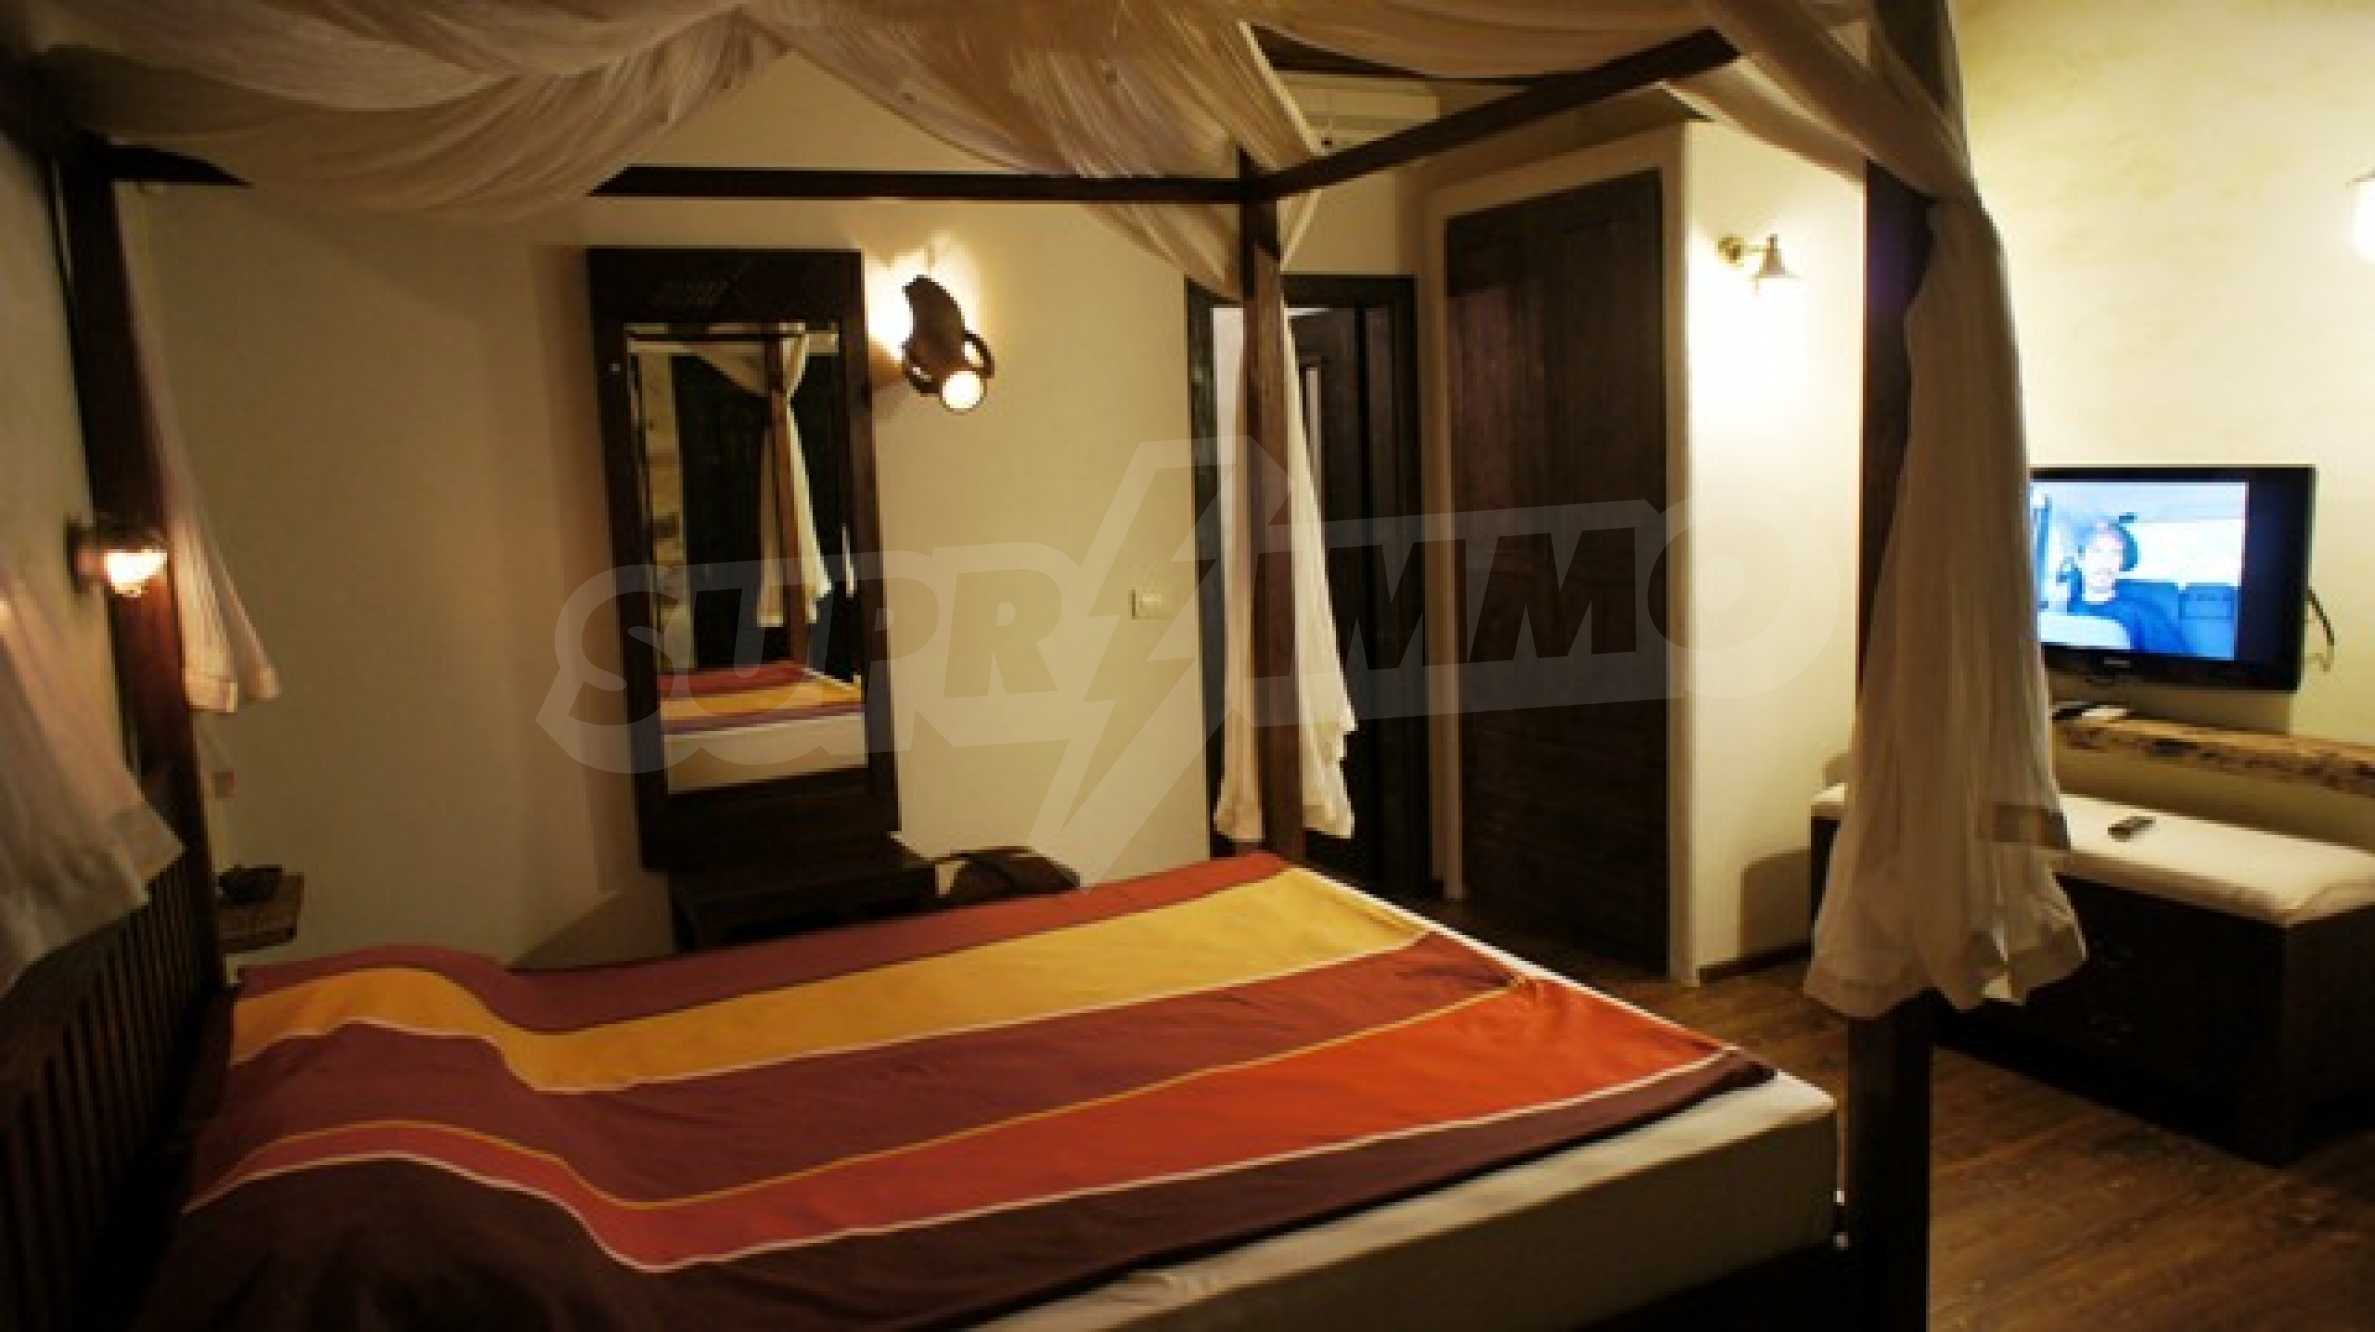 The Mediterranean style - a sense of luxury 42